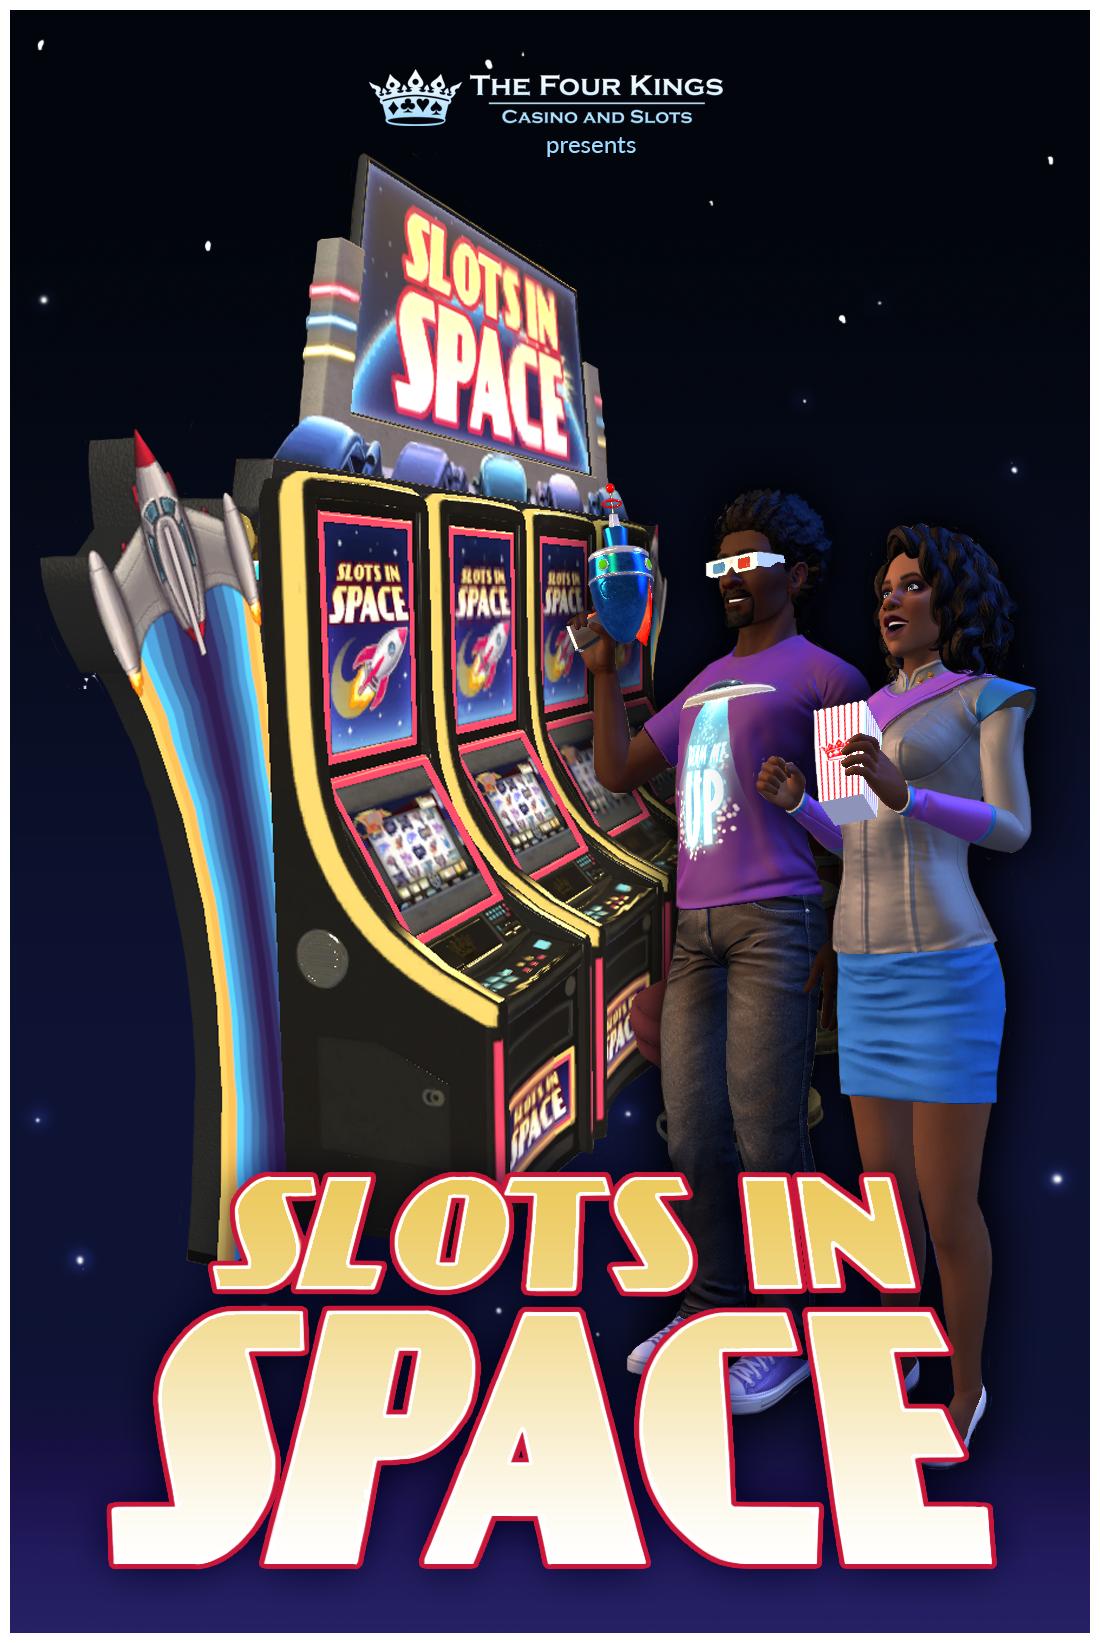 Casino And Slots